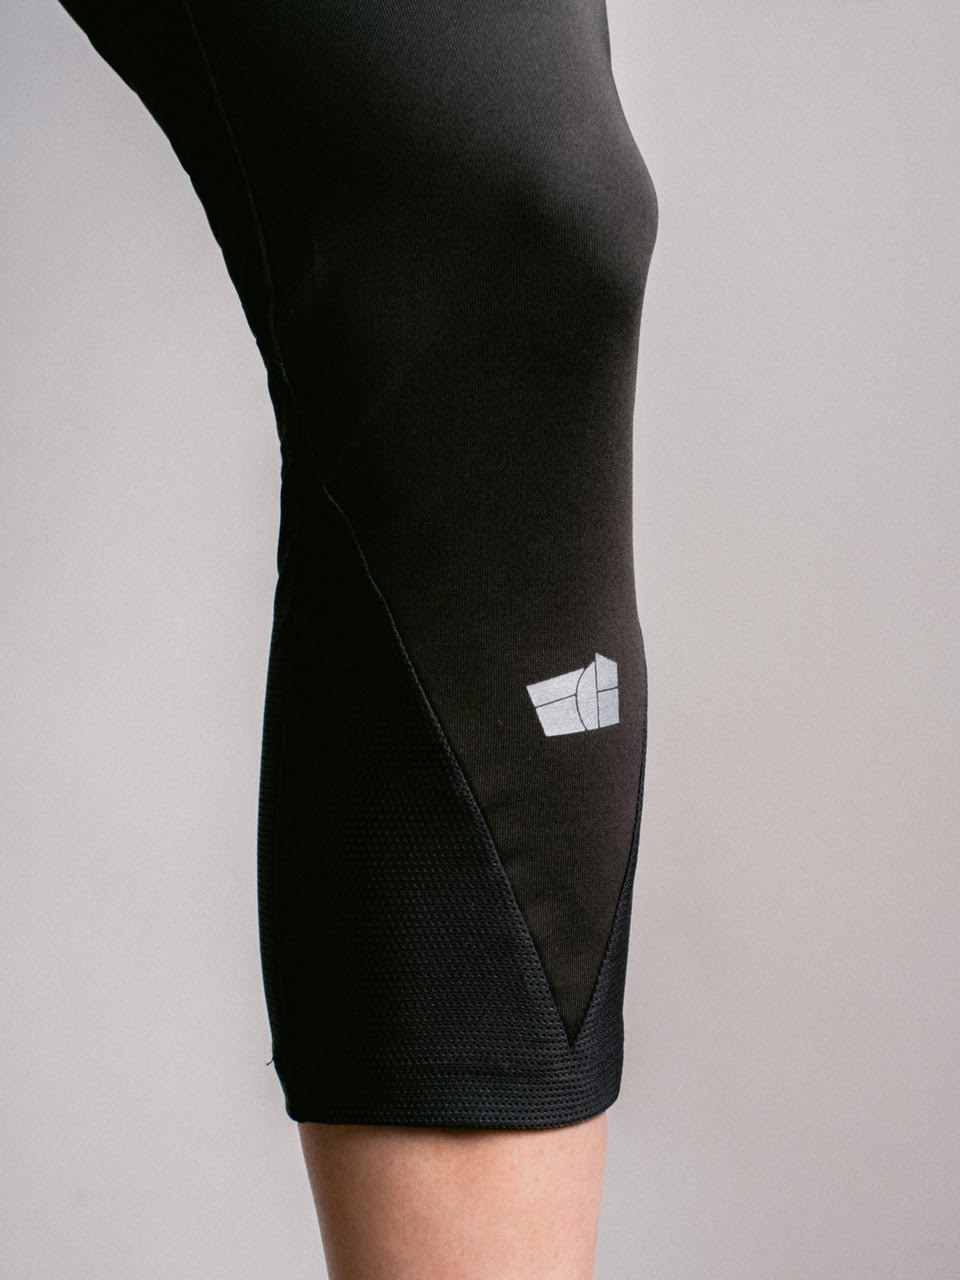 Creta Legging - Leg Detail - ÉCH Apparel